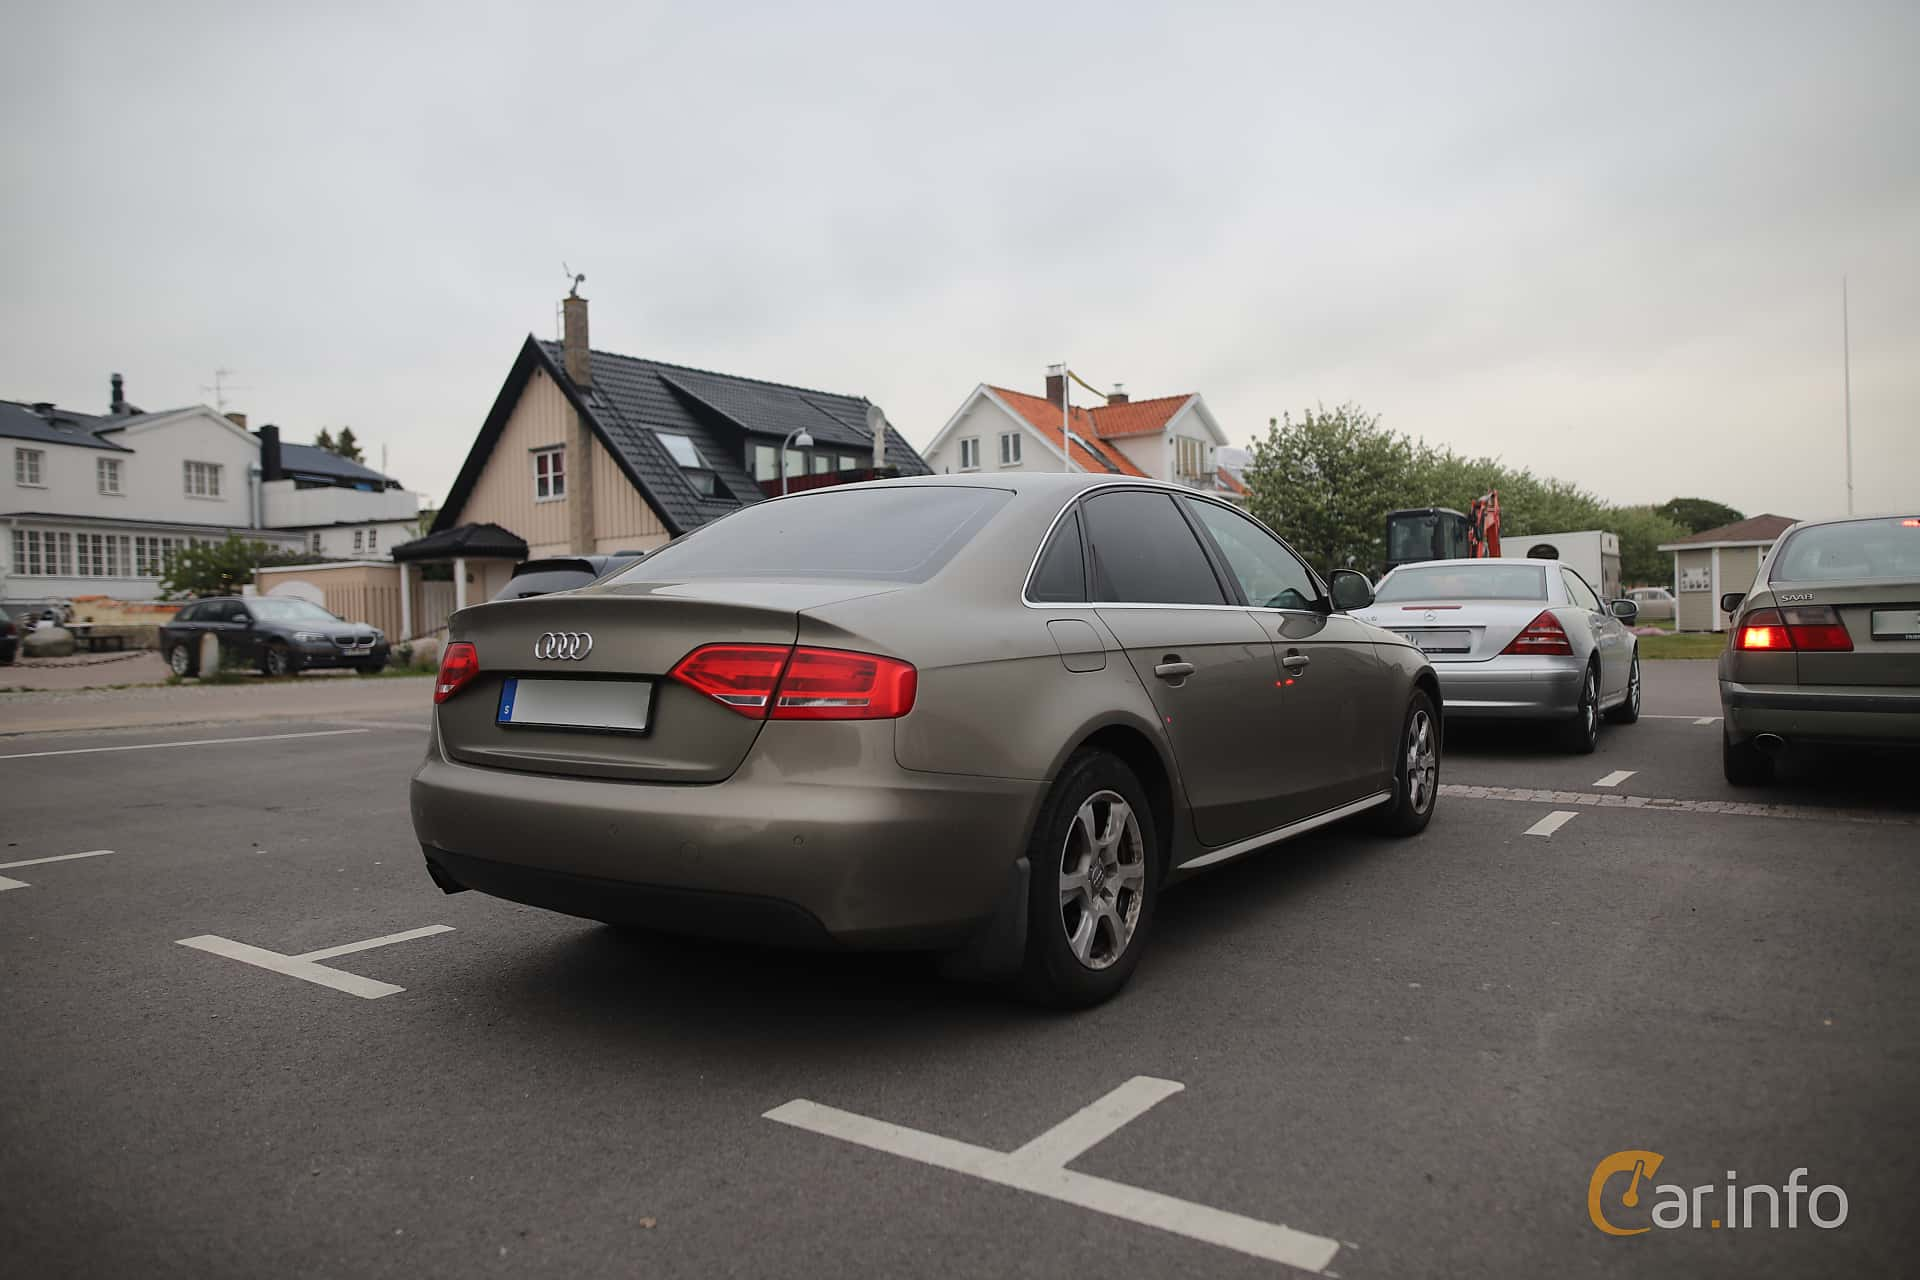 Audi A4 Sedan 1.8 TFSI Multitronic, 160hp, 2009